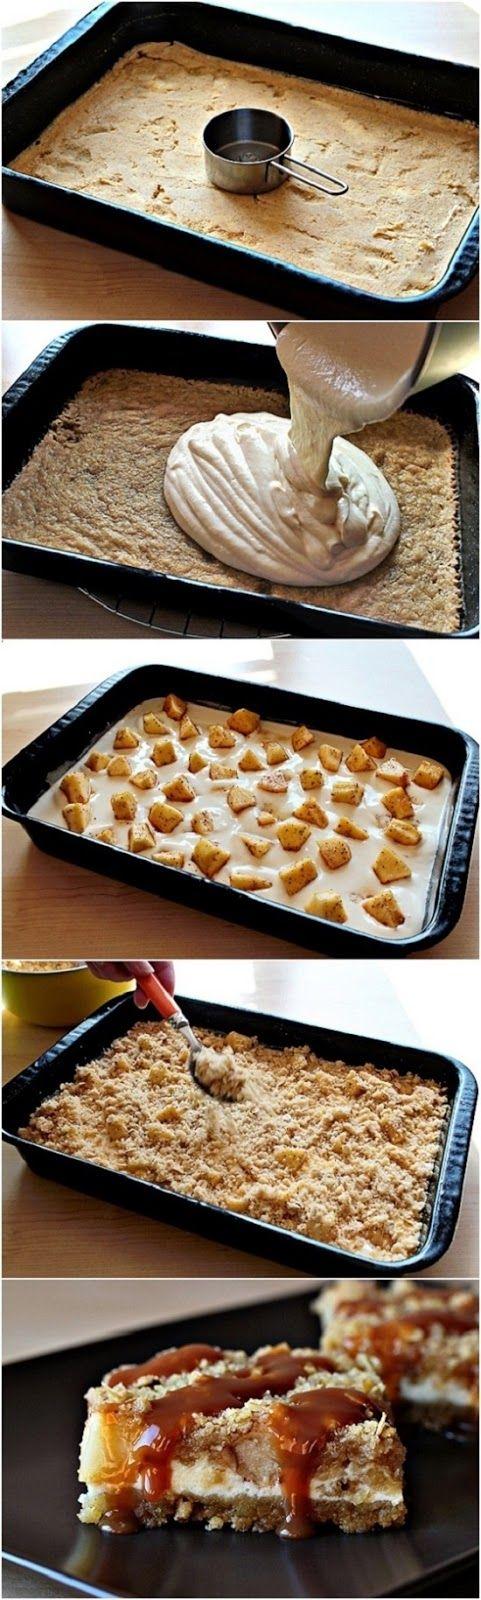 Inspiring snaps: Caramel Apple Cheesecake Bars